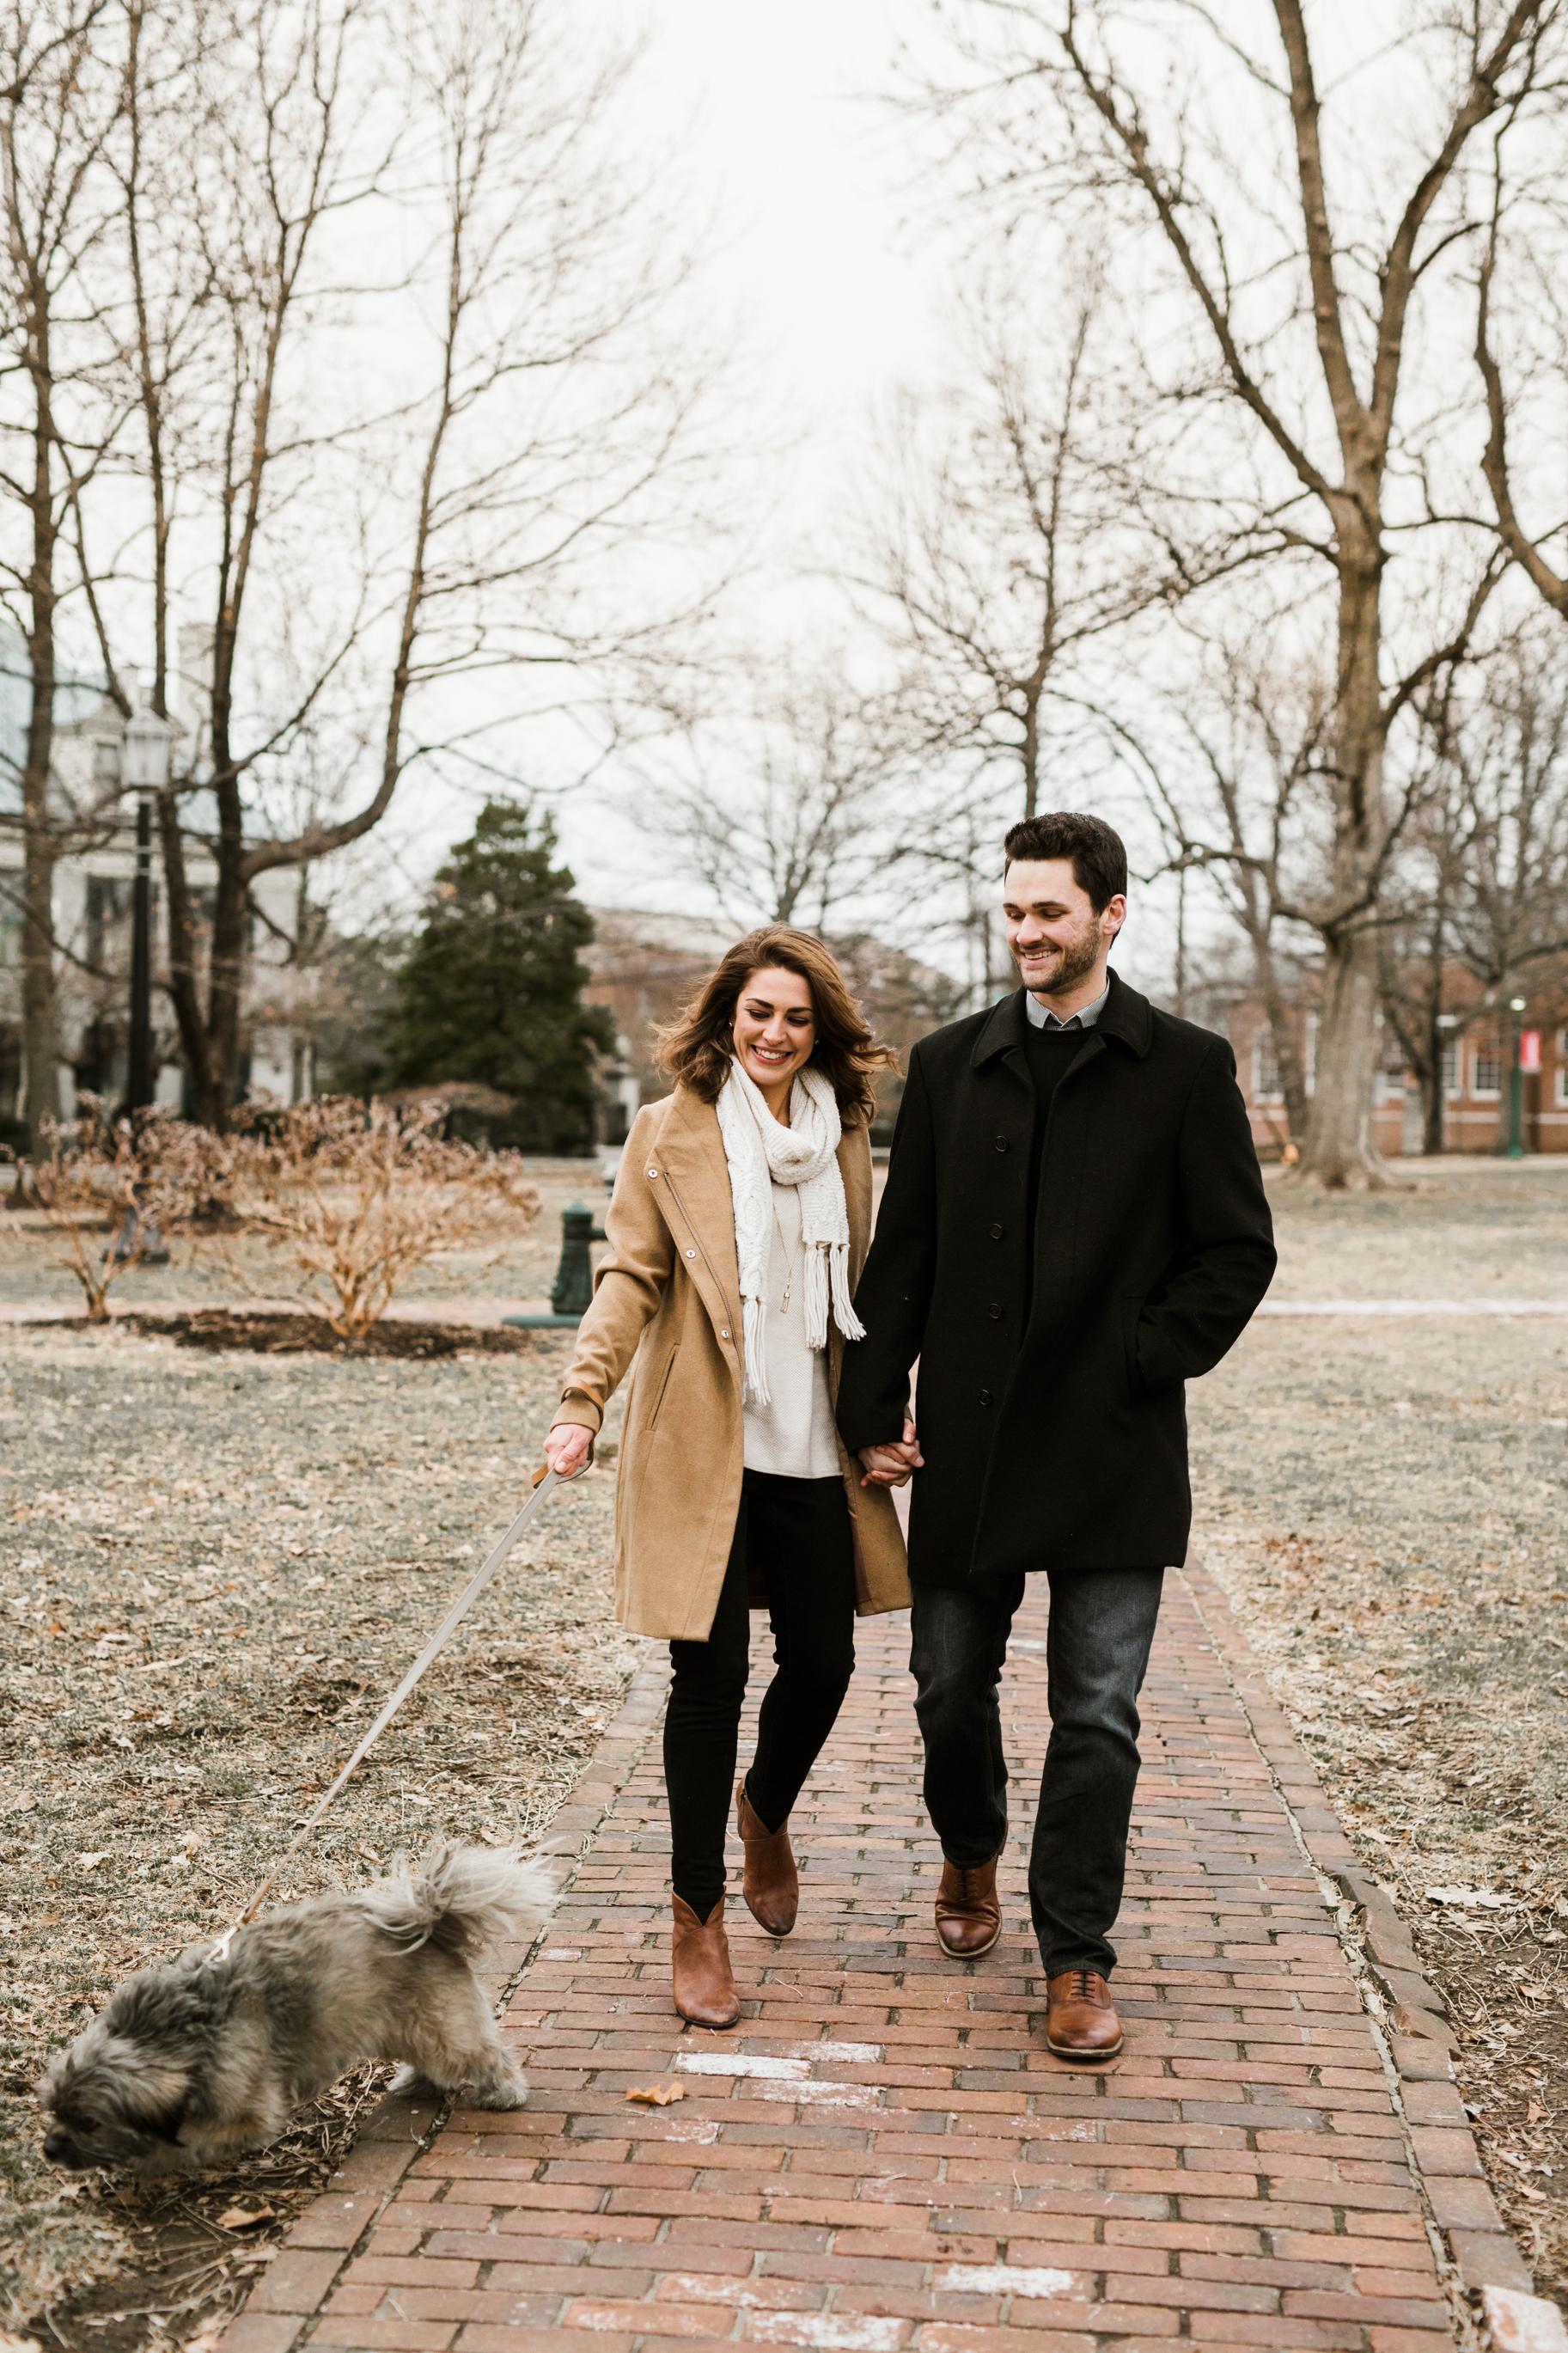 Ellen & Lee Engagement 2018 WEBSITE SP Crystal Ludwick Photo (33 of 54).jpg